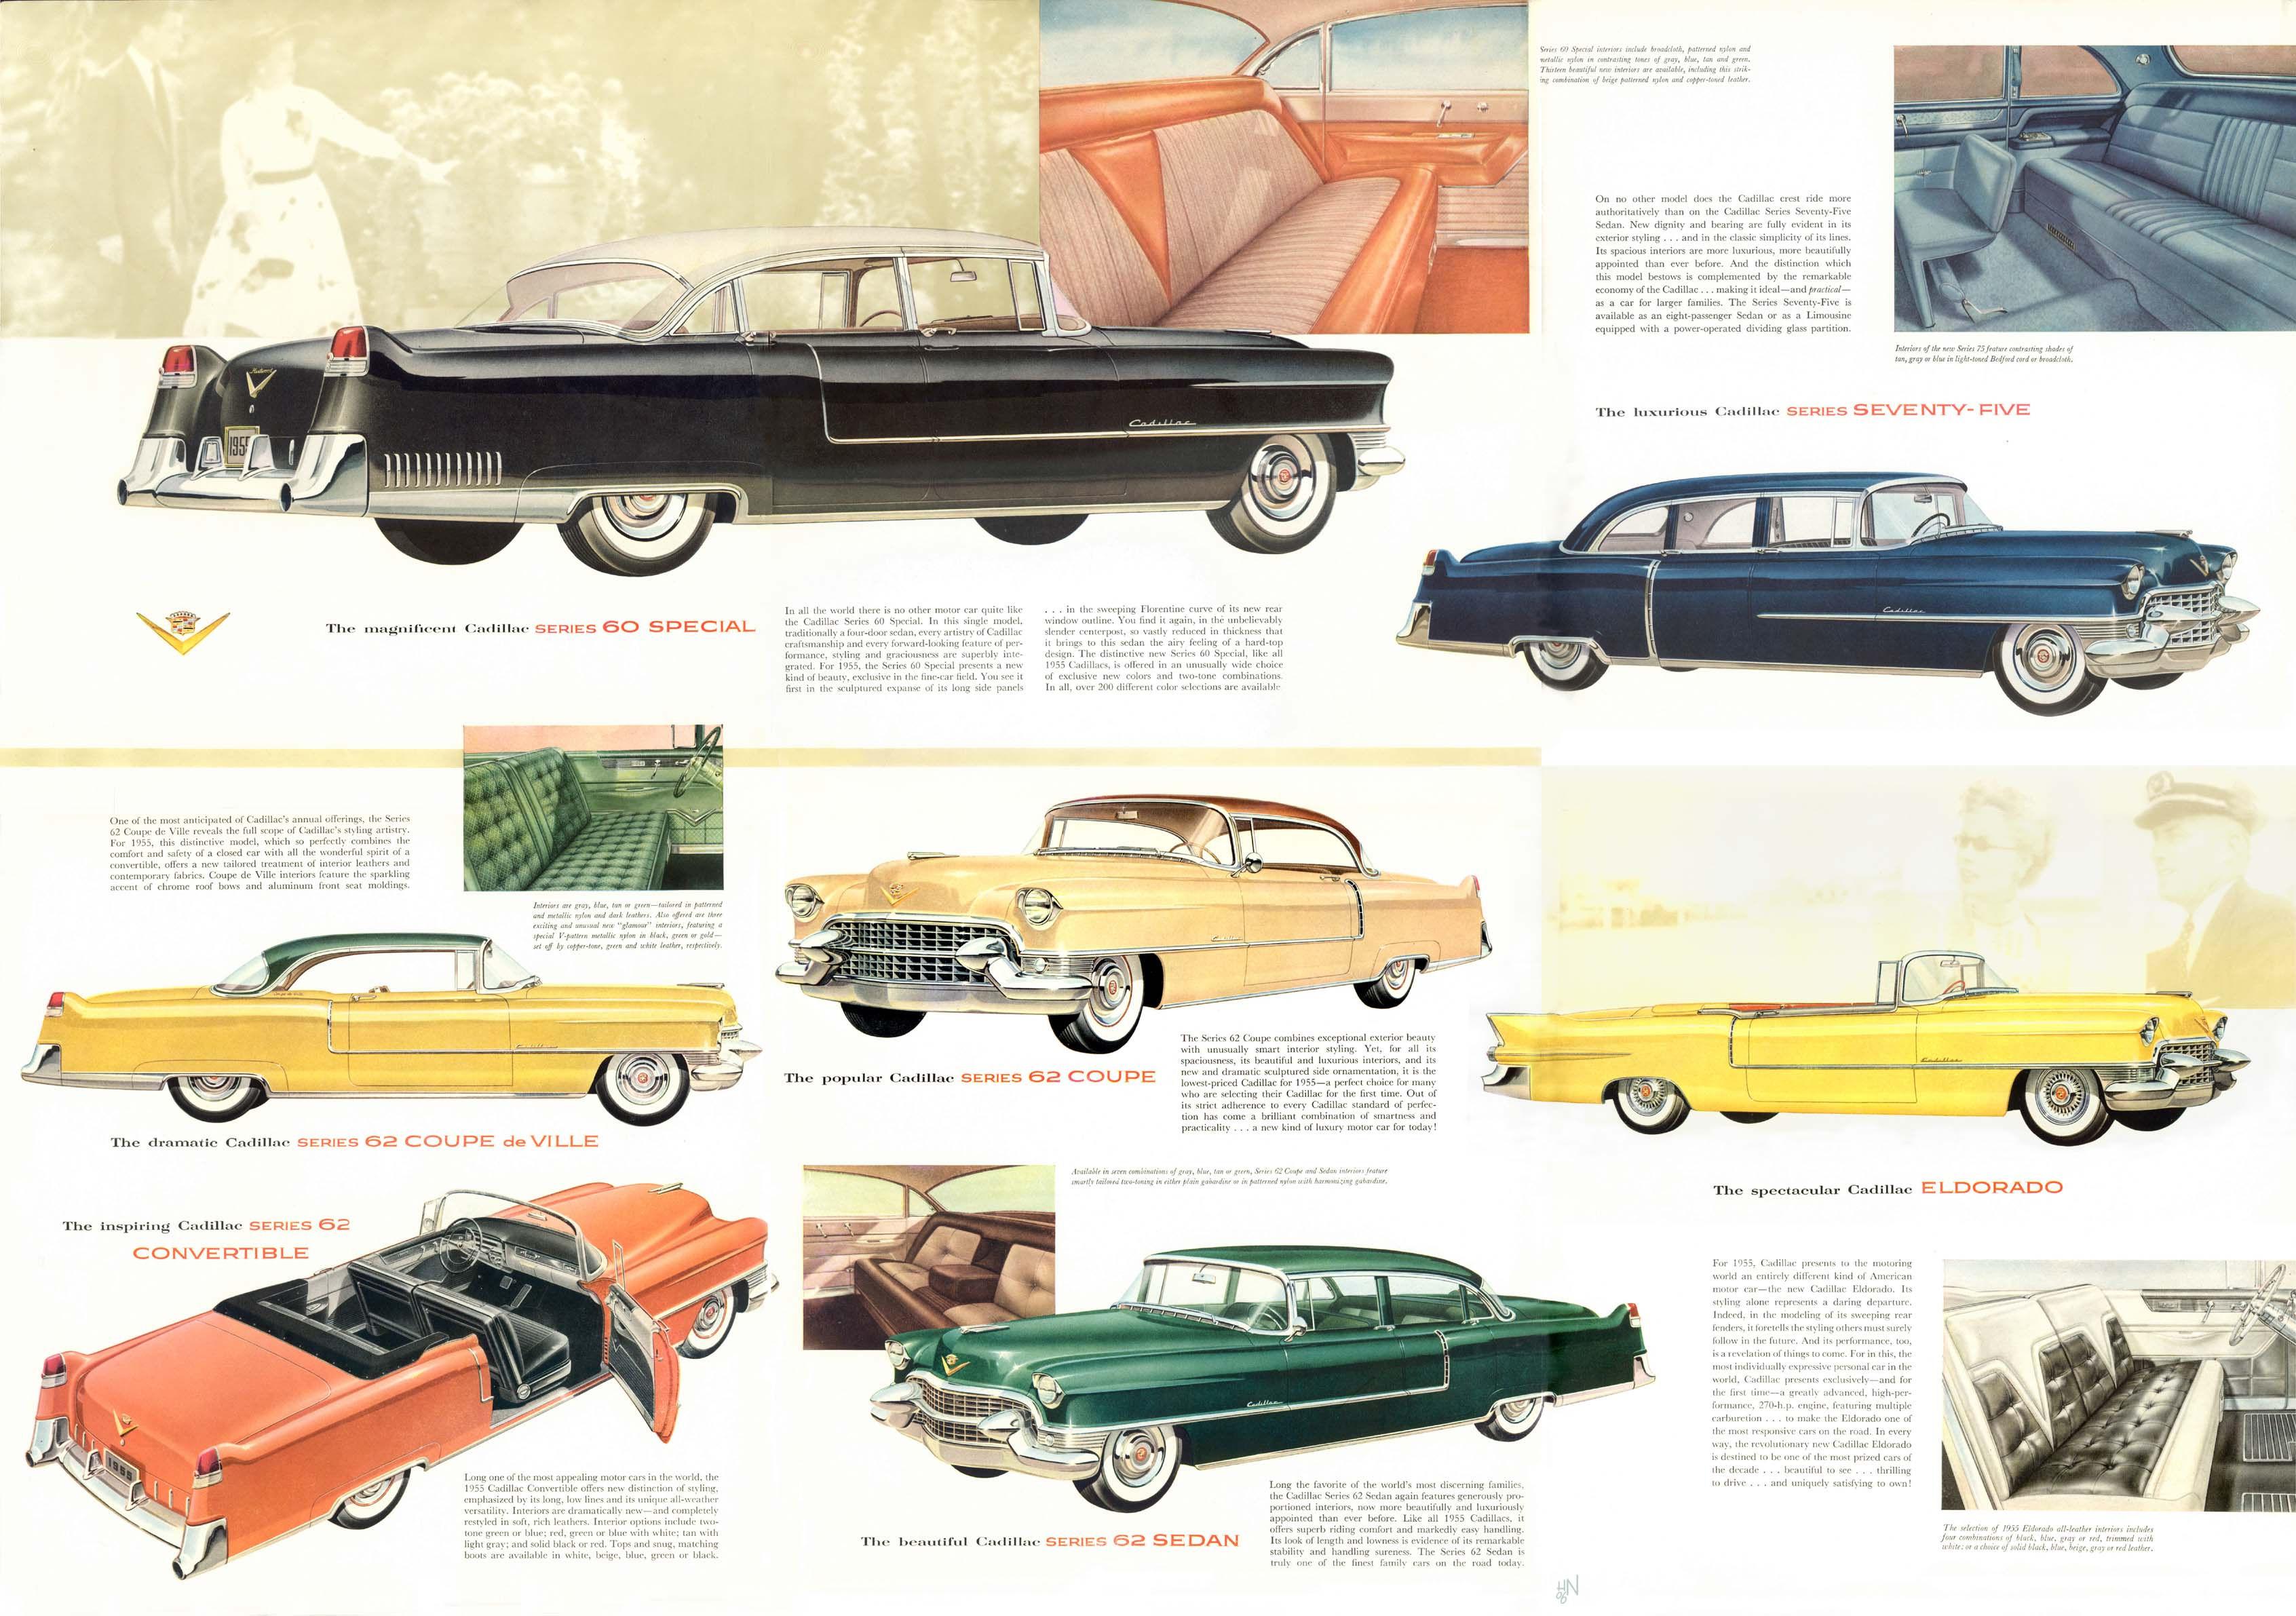 1955 cadillac series 60 special